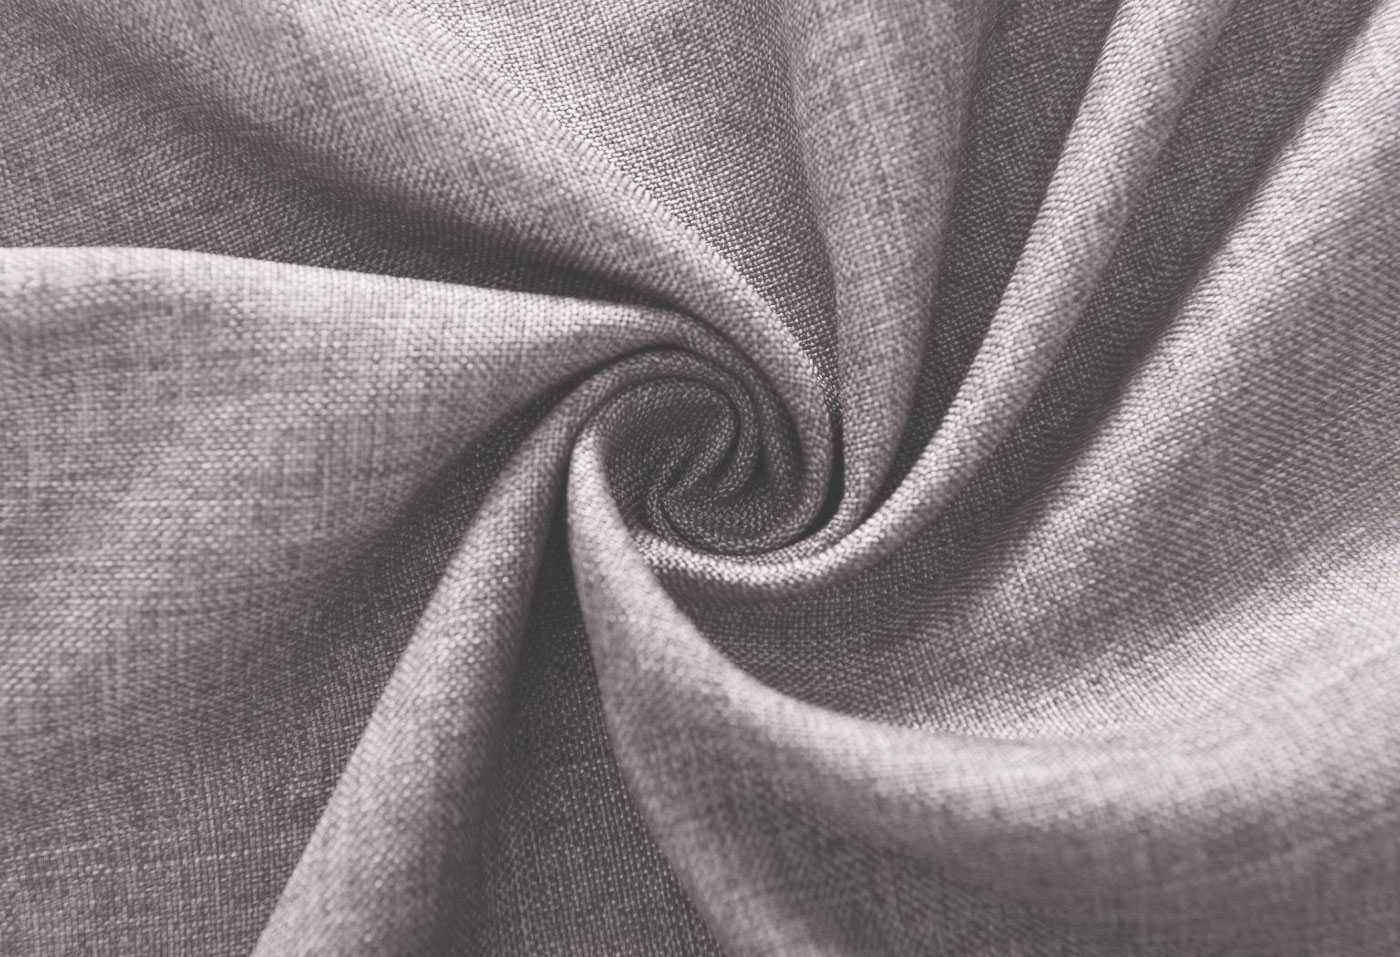 vorhang schlaufen cationic blickdicht leinen optik 1 st ck 245x140 grau ebay. Black Bedroom Furniture Sets. Home Design Ideas